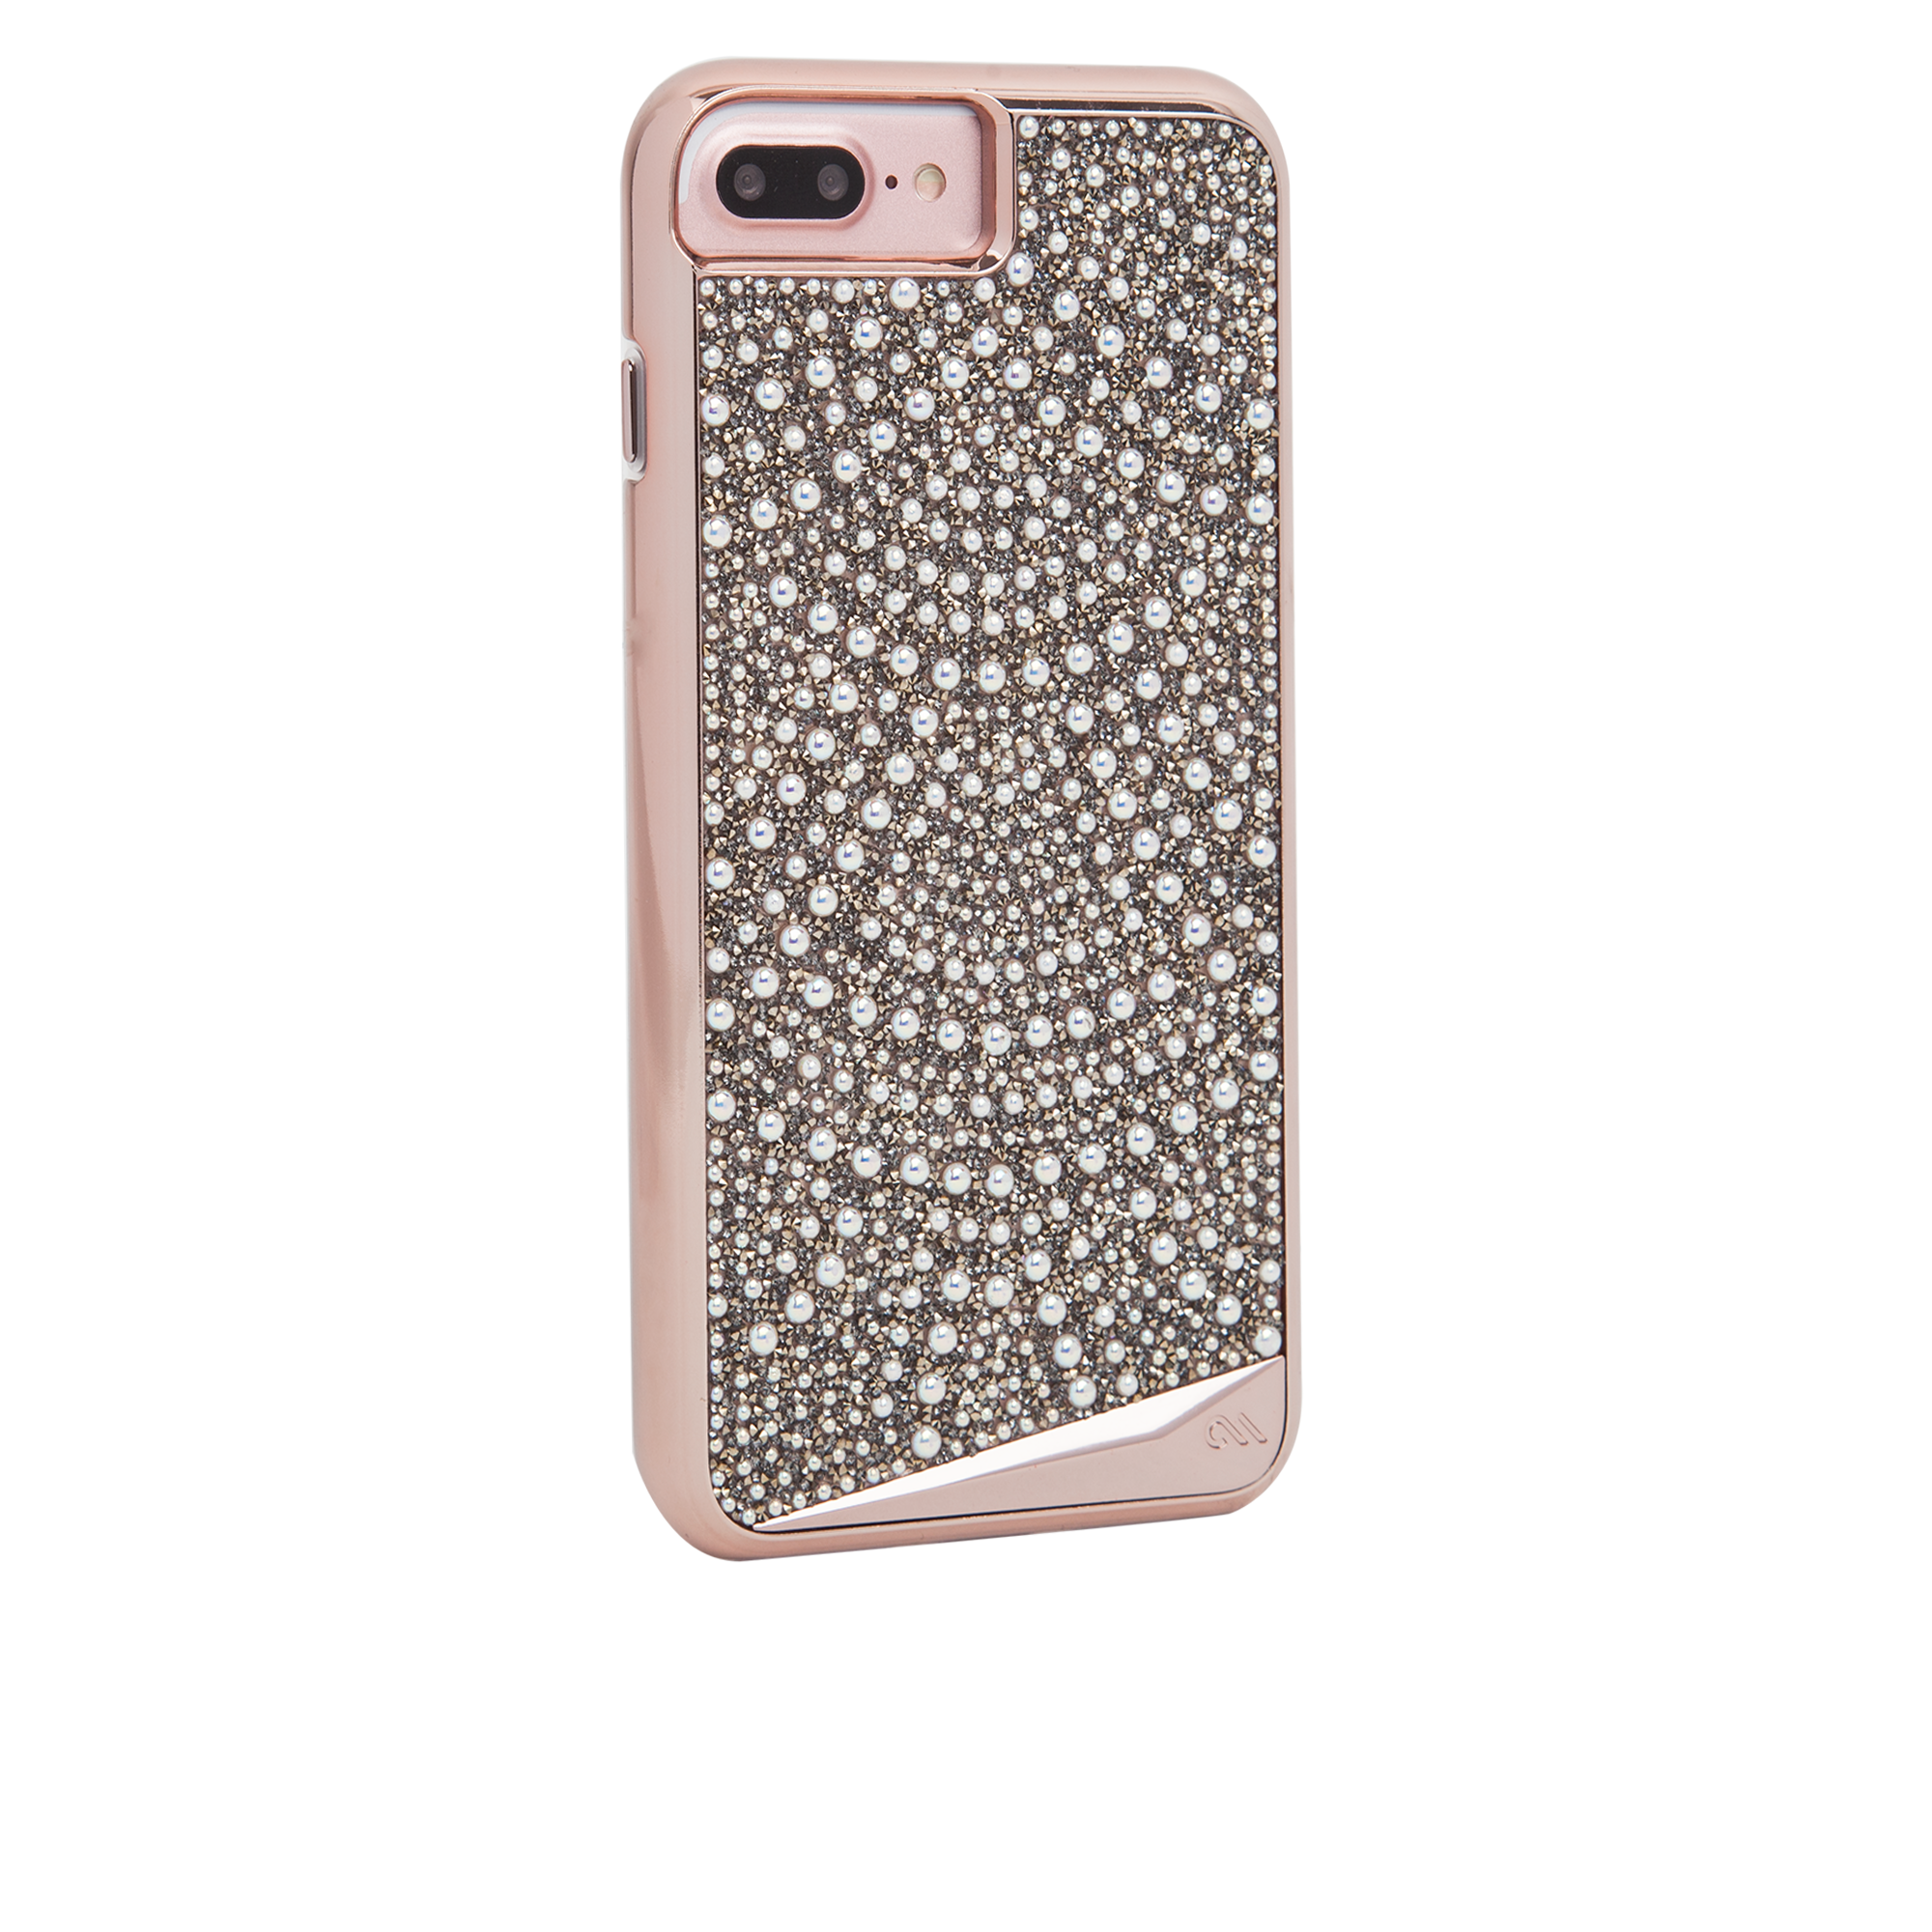 iphone 6 tough case rose gold